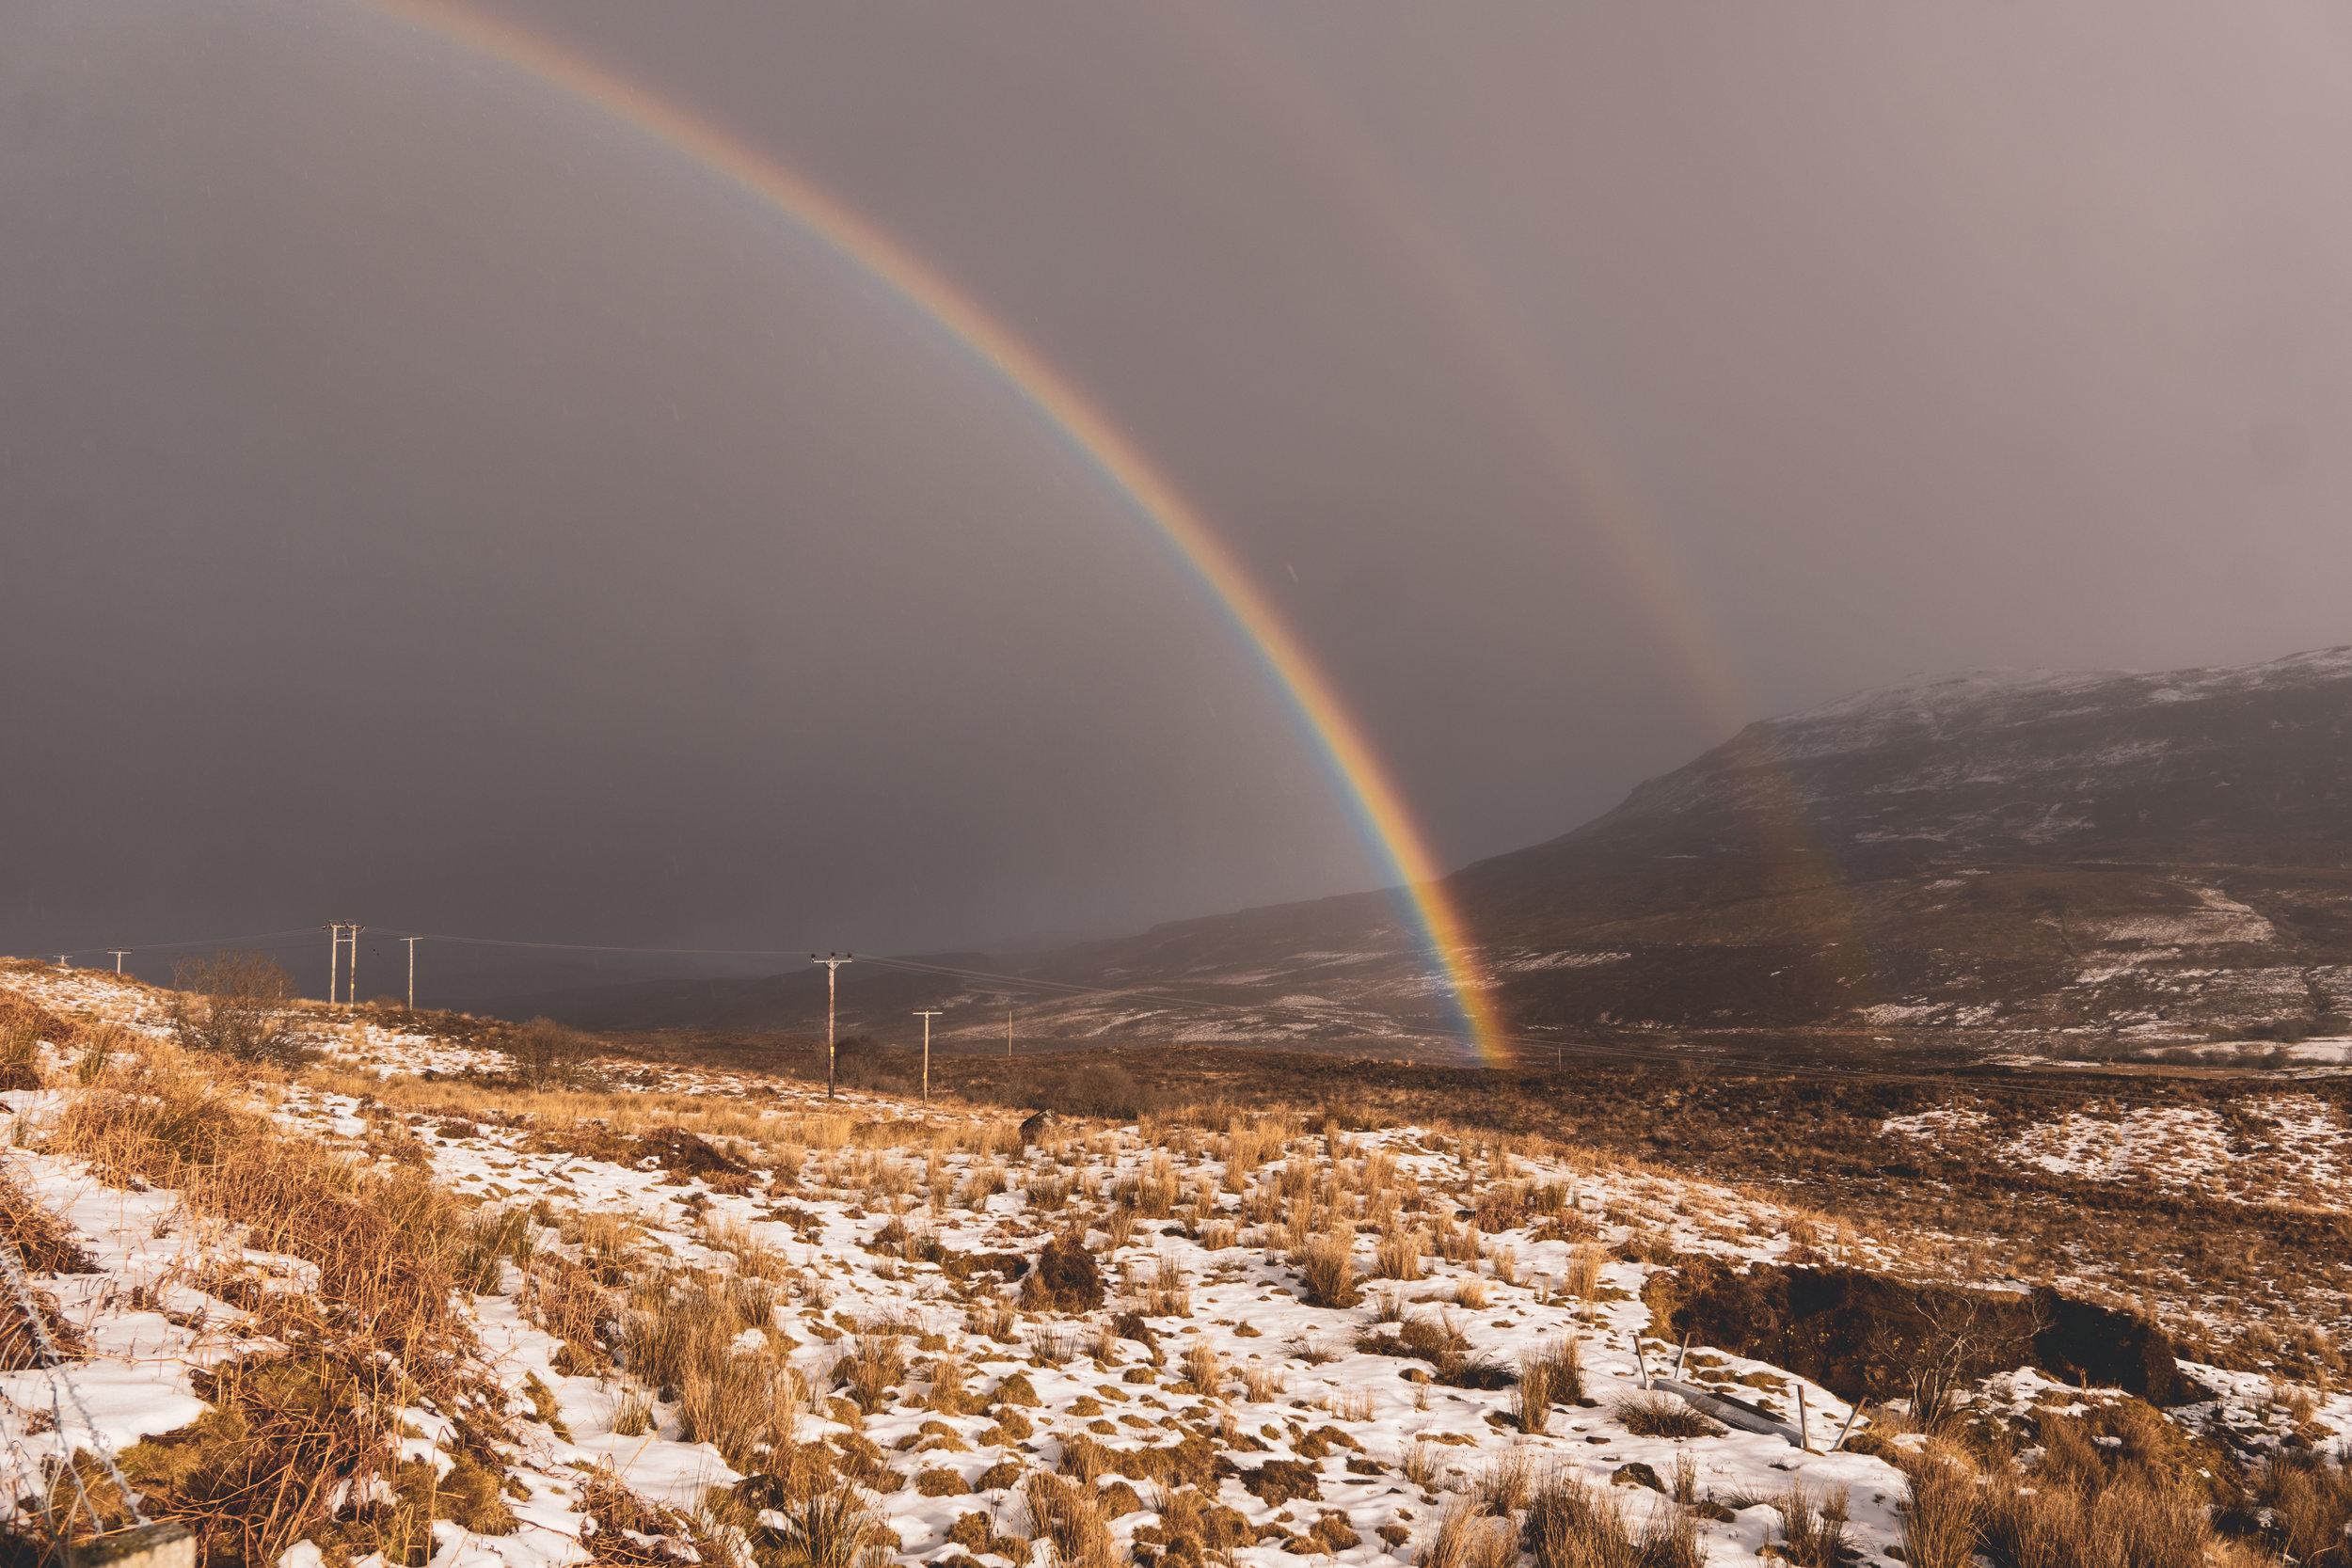 Isle-of-Skye-Fairy-Glen-und-Braes (2).jpg